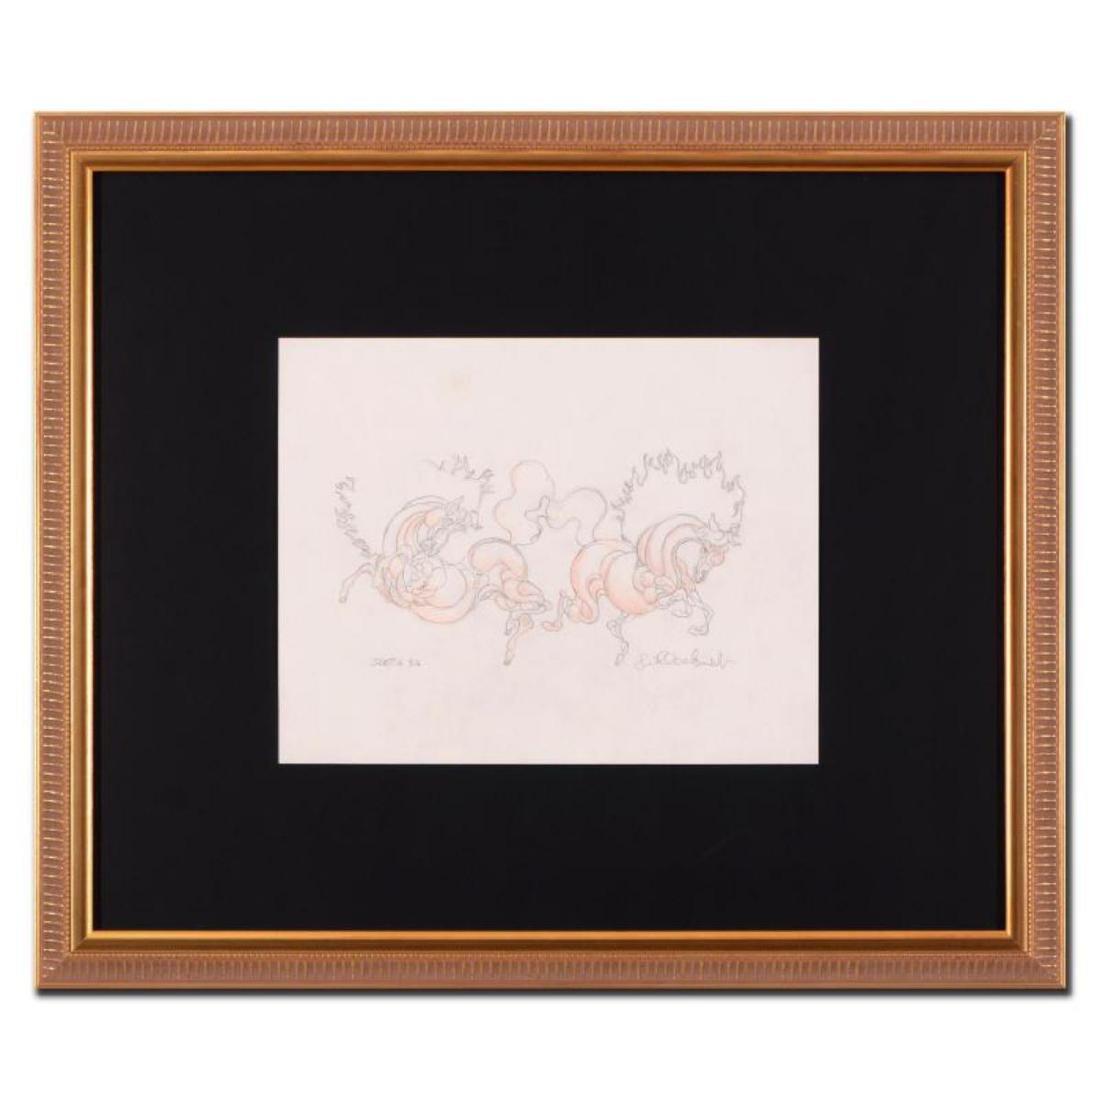 "Guillaume Azoulay - ""BG Sketch"" Framed Original"